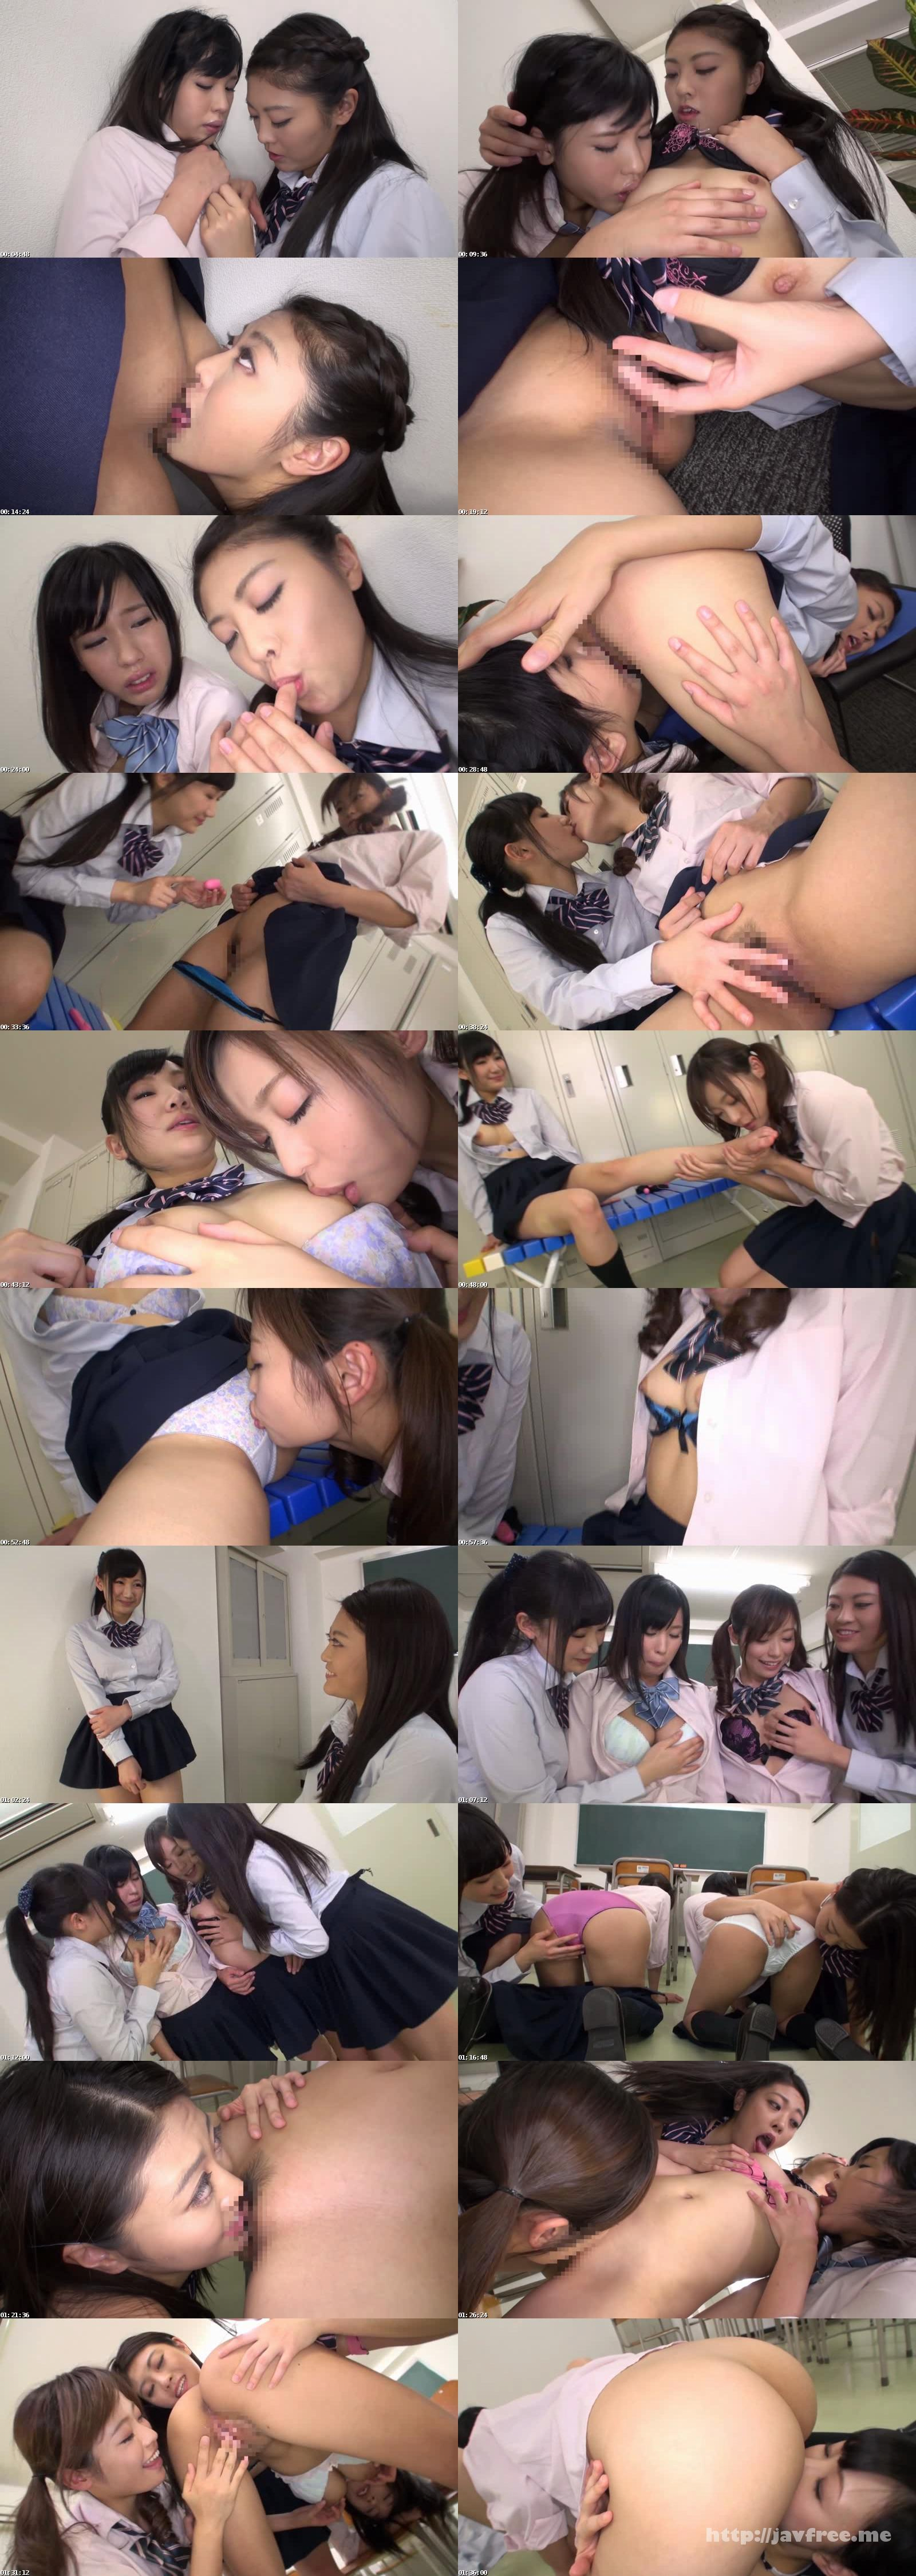 [DIV 193] 女子校スワッピングレズビアン 2 鈴森汐那 逢沢るる 星川麻紀 みおり舞 DIV